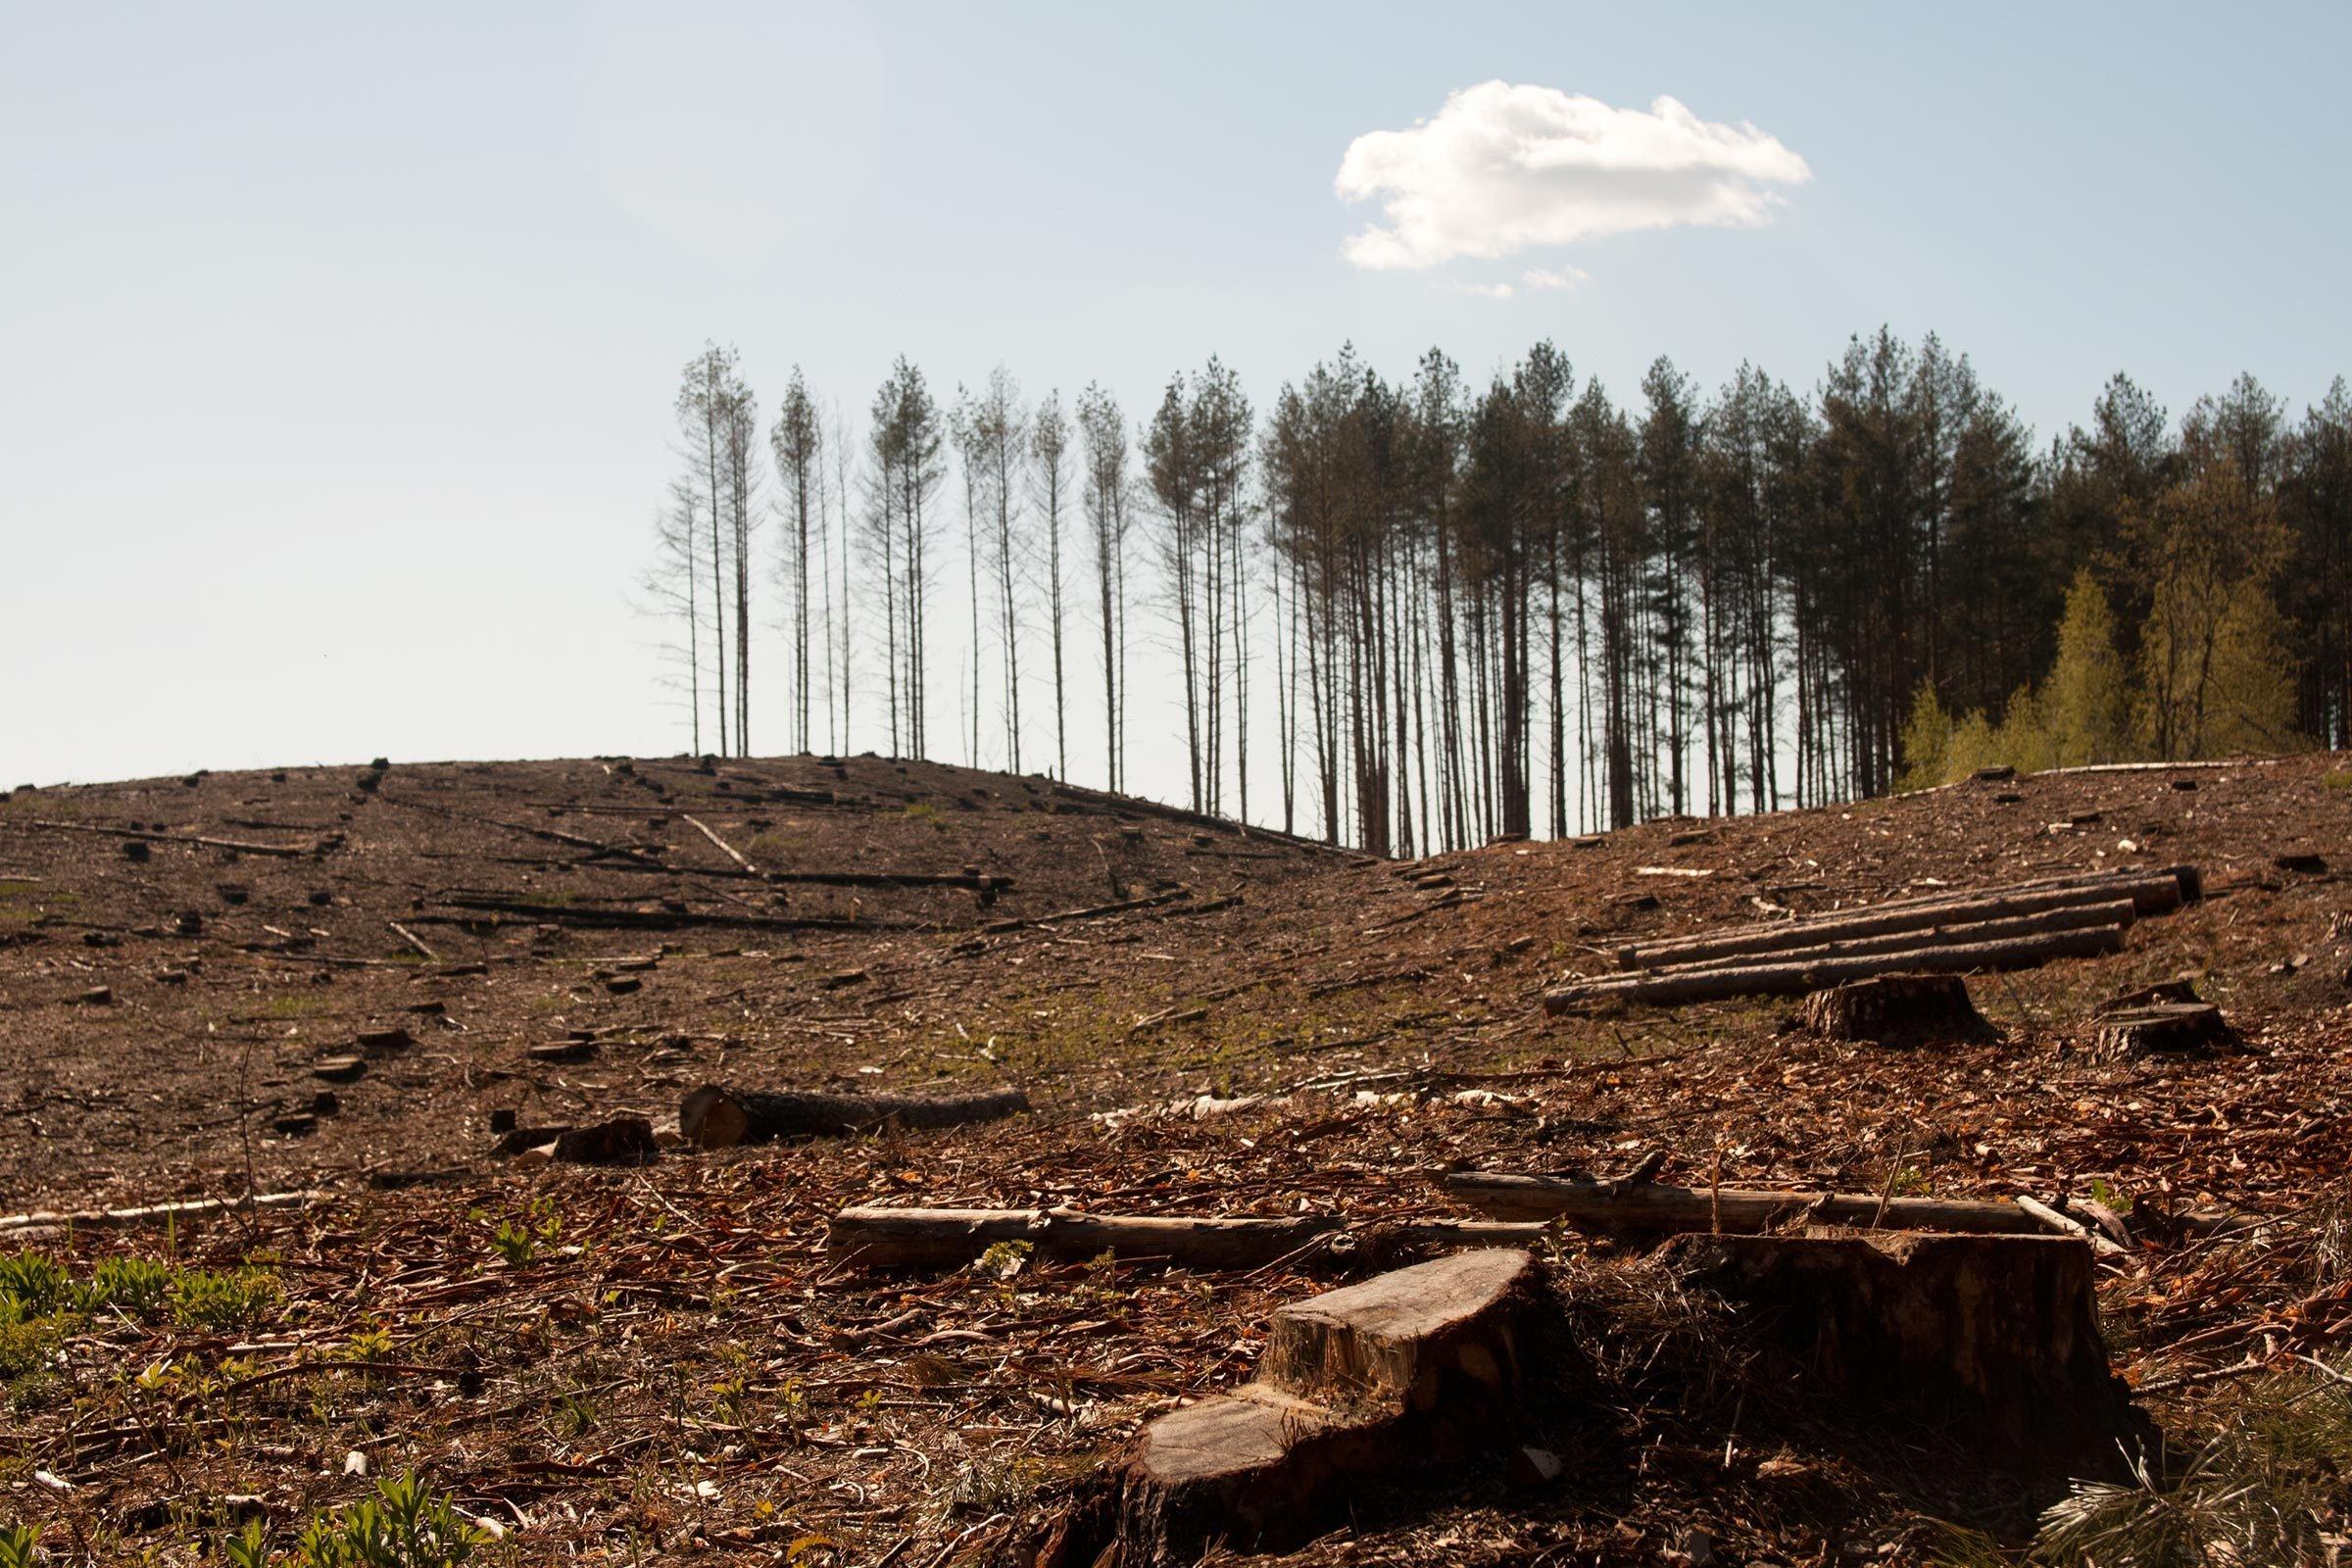 deforestation cut down trees